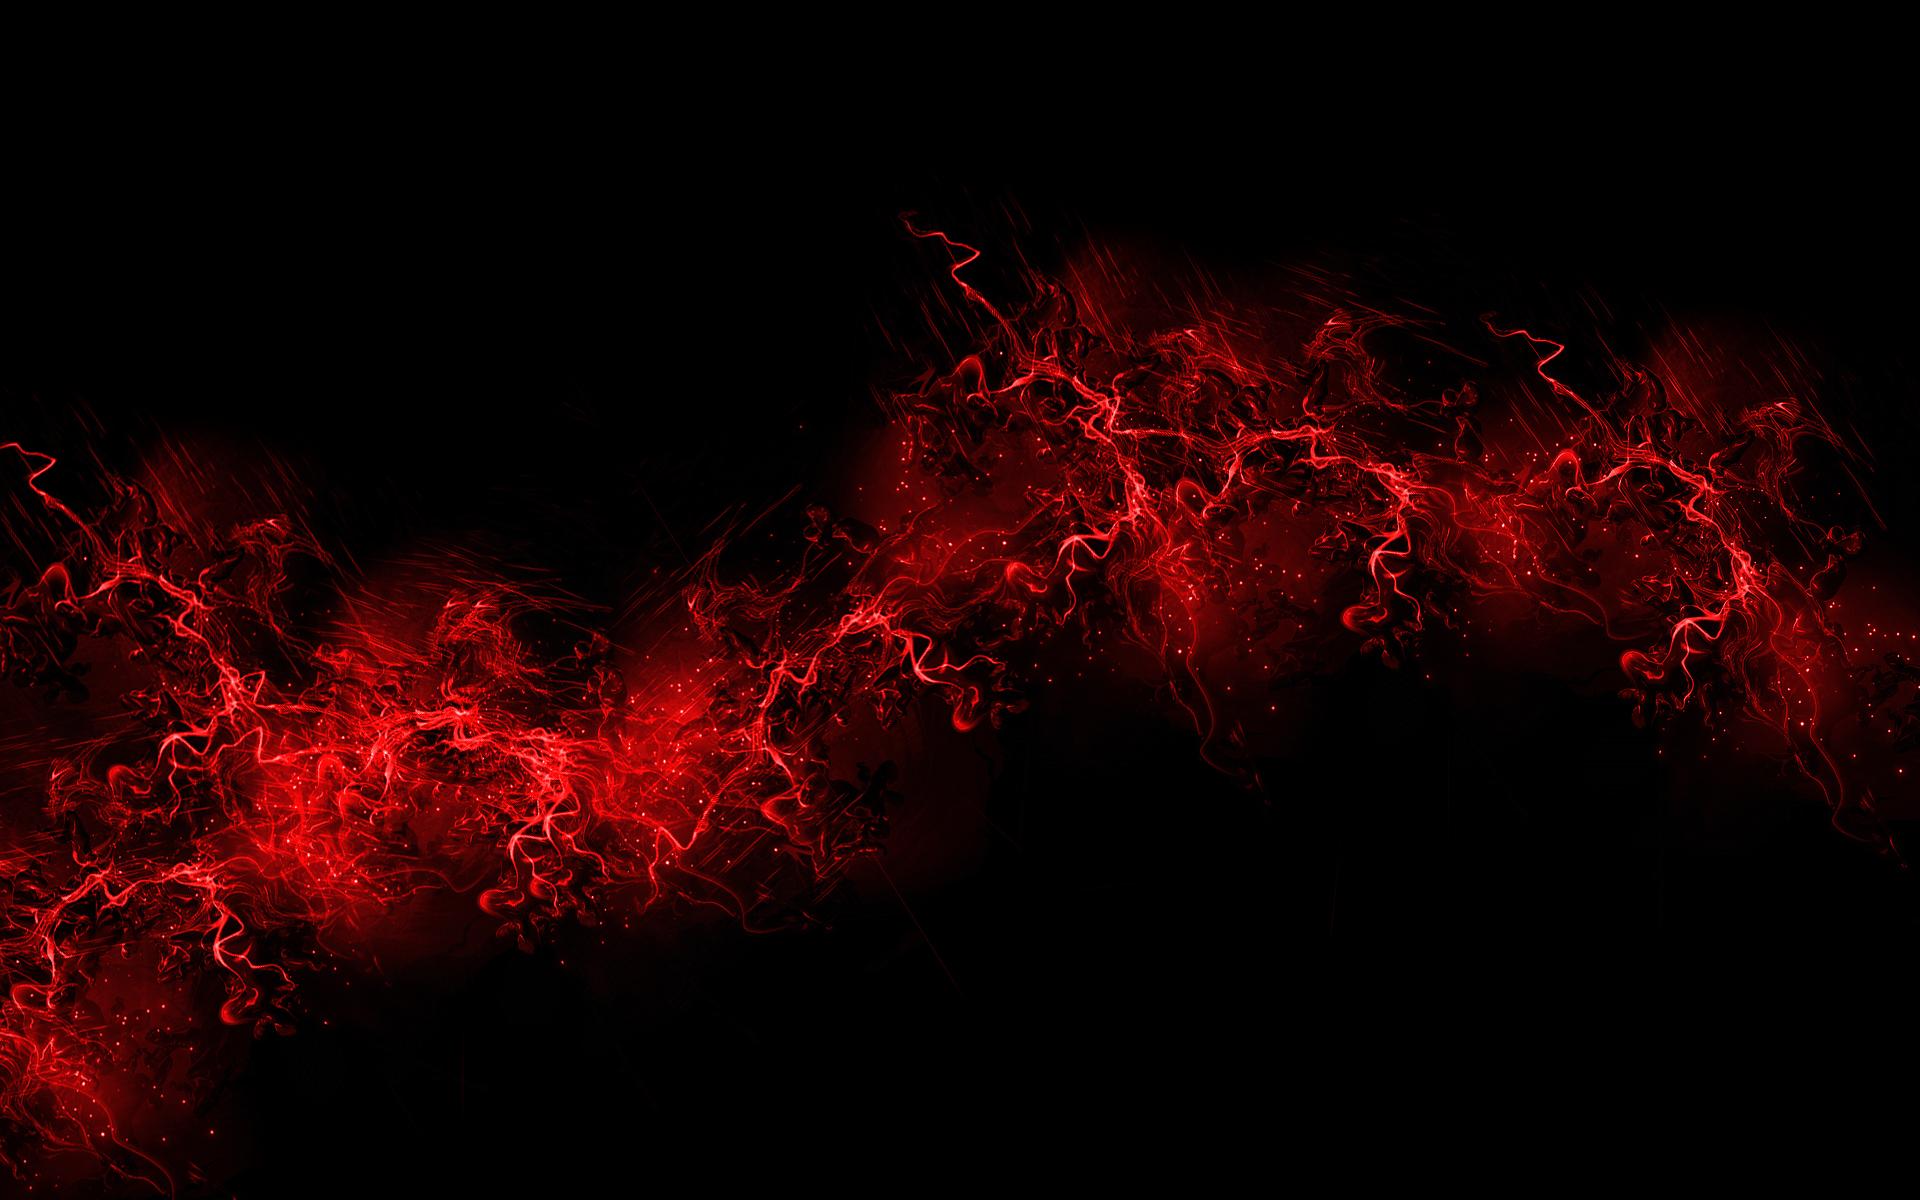 original wallpaper download Red flames on black wallpaper   1920x1200 1920x1200